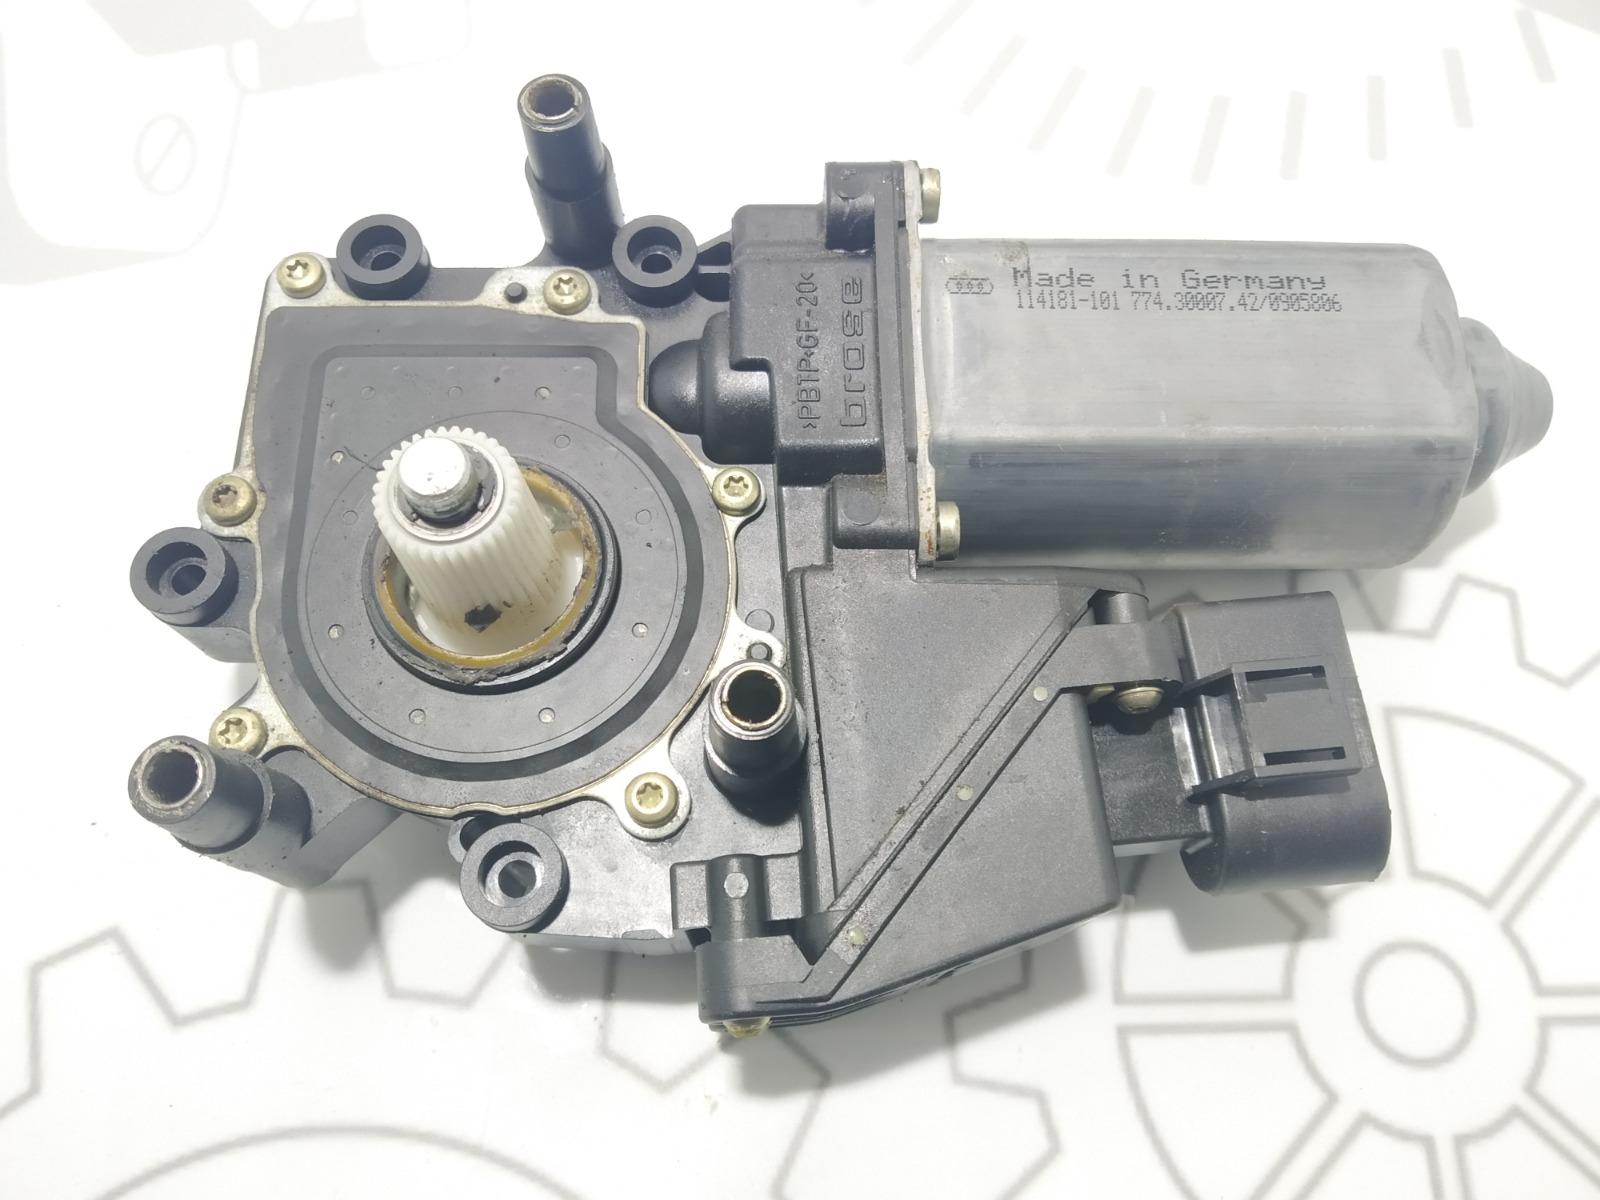 Моторчик стеклоподъемника передний левый Audi A6 C5 1.8 TI 1998 (б/у)